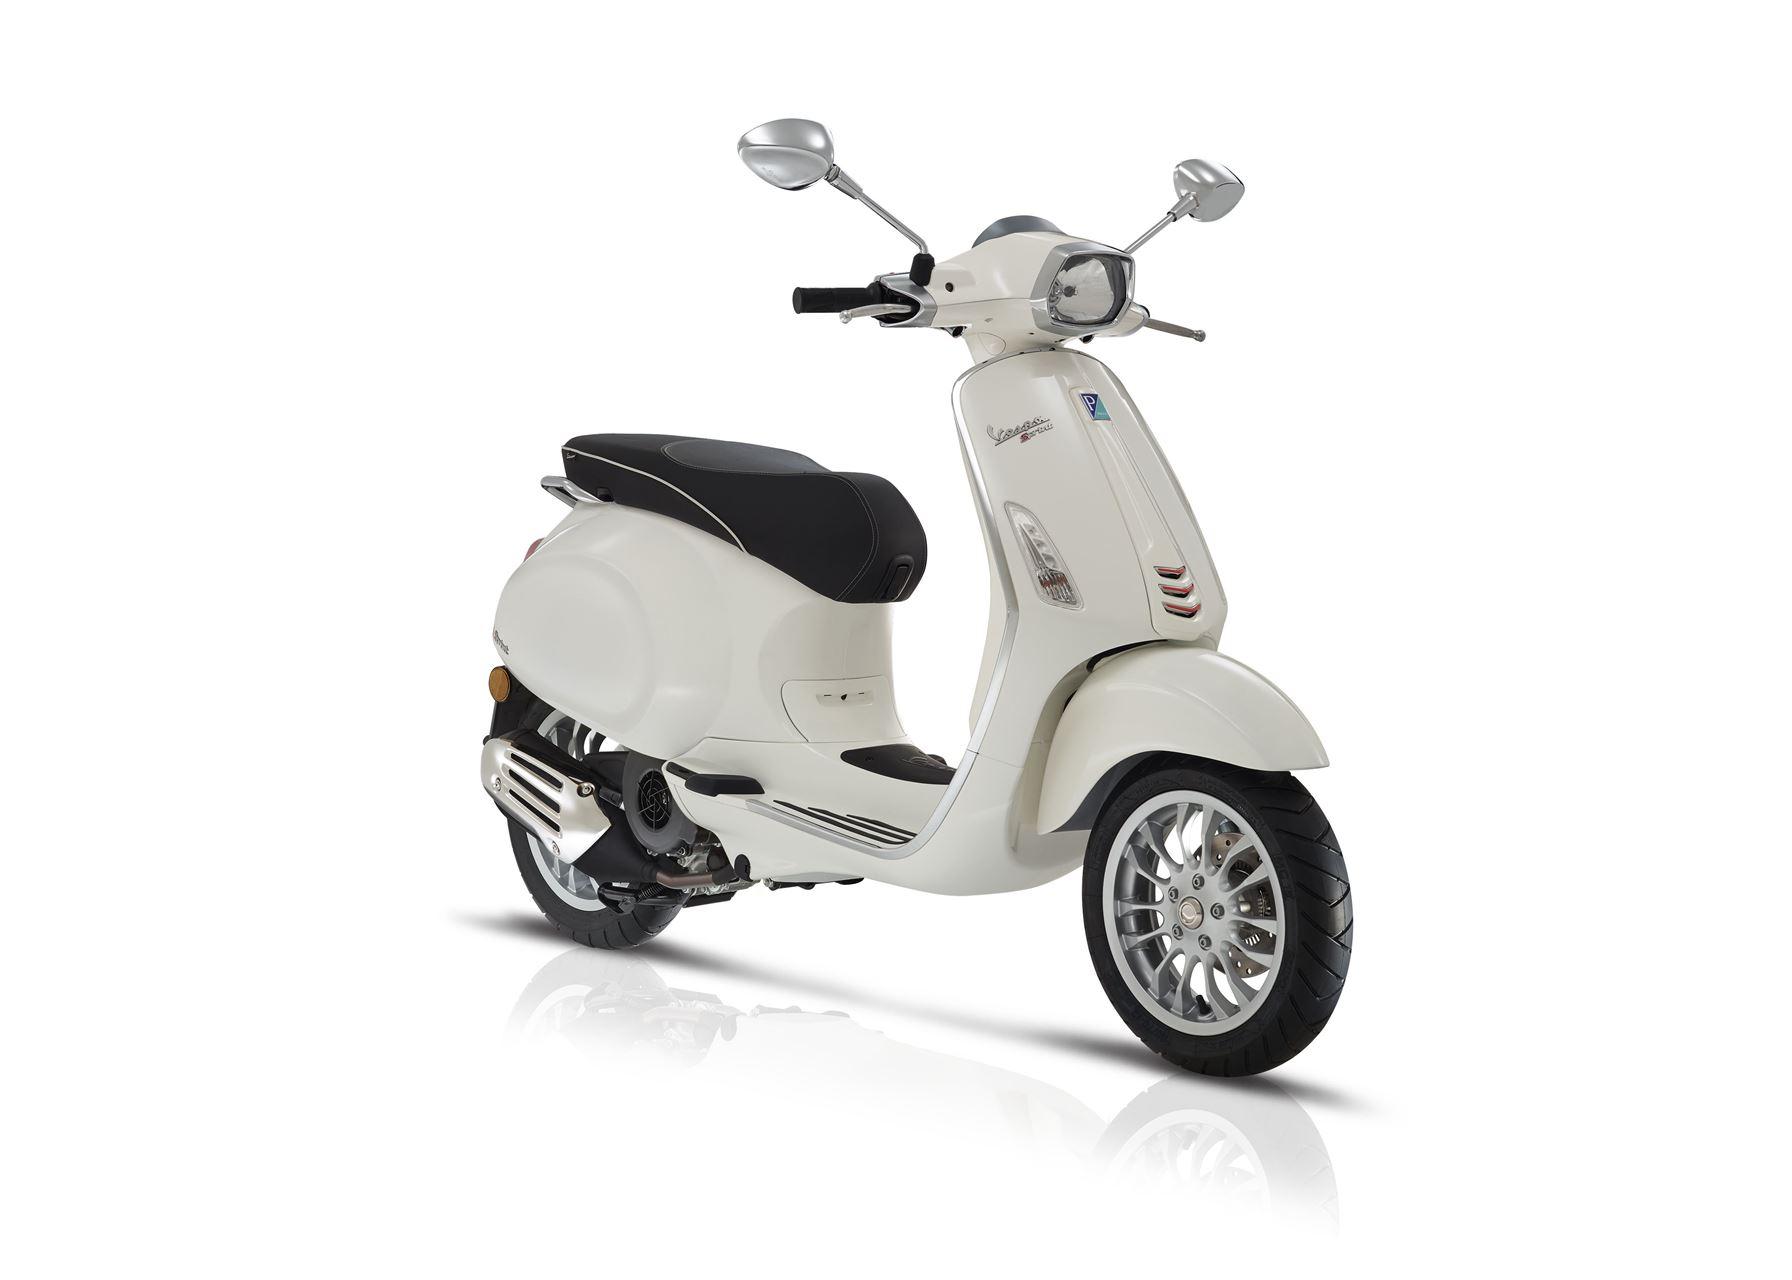 vespa sprint 125 scooter gama 125cc andar de moto. Black Bedroom Furniture Sets. Home Design Ideas